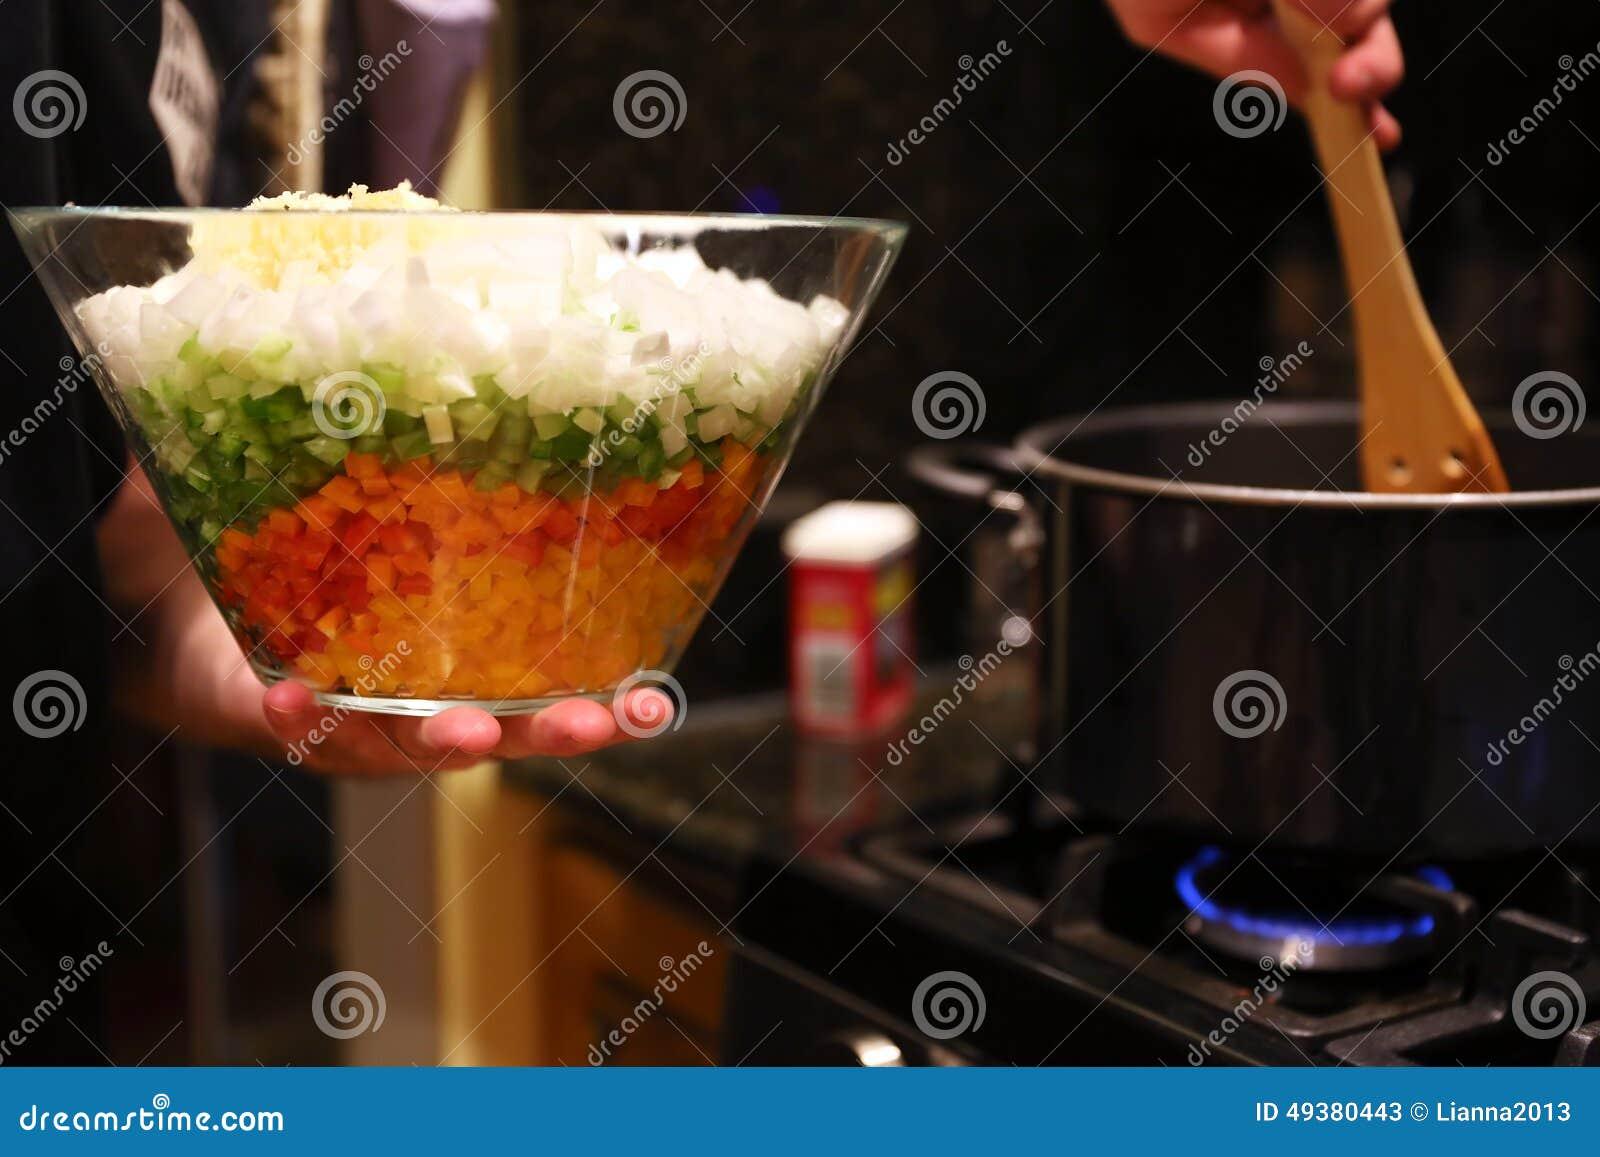 chef preparing vegetables at stove in a restaurant kitchen